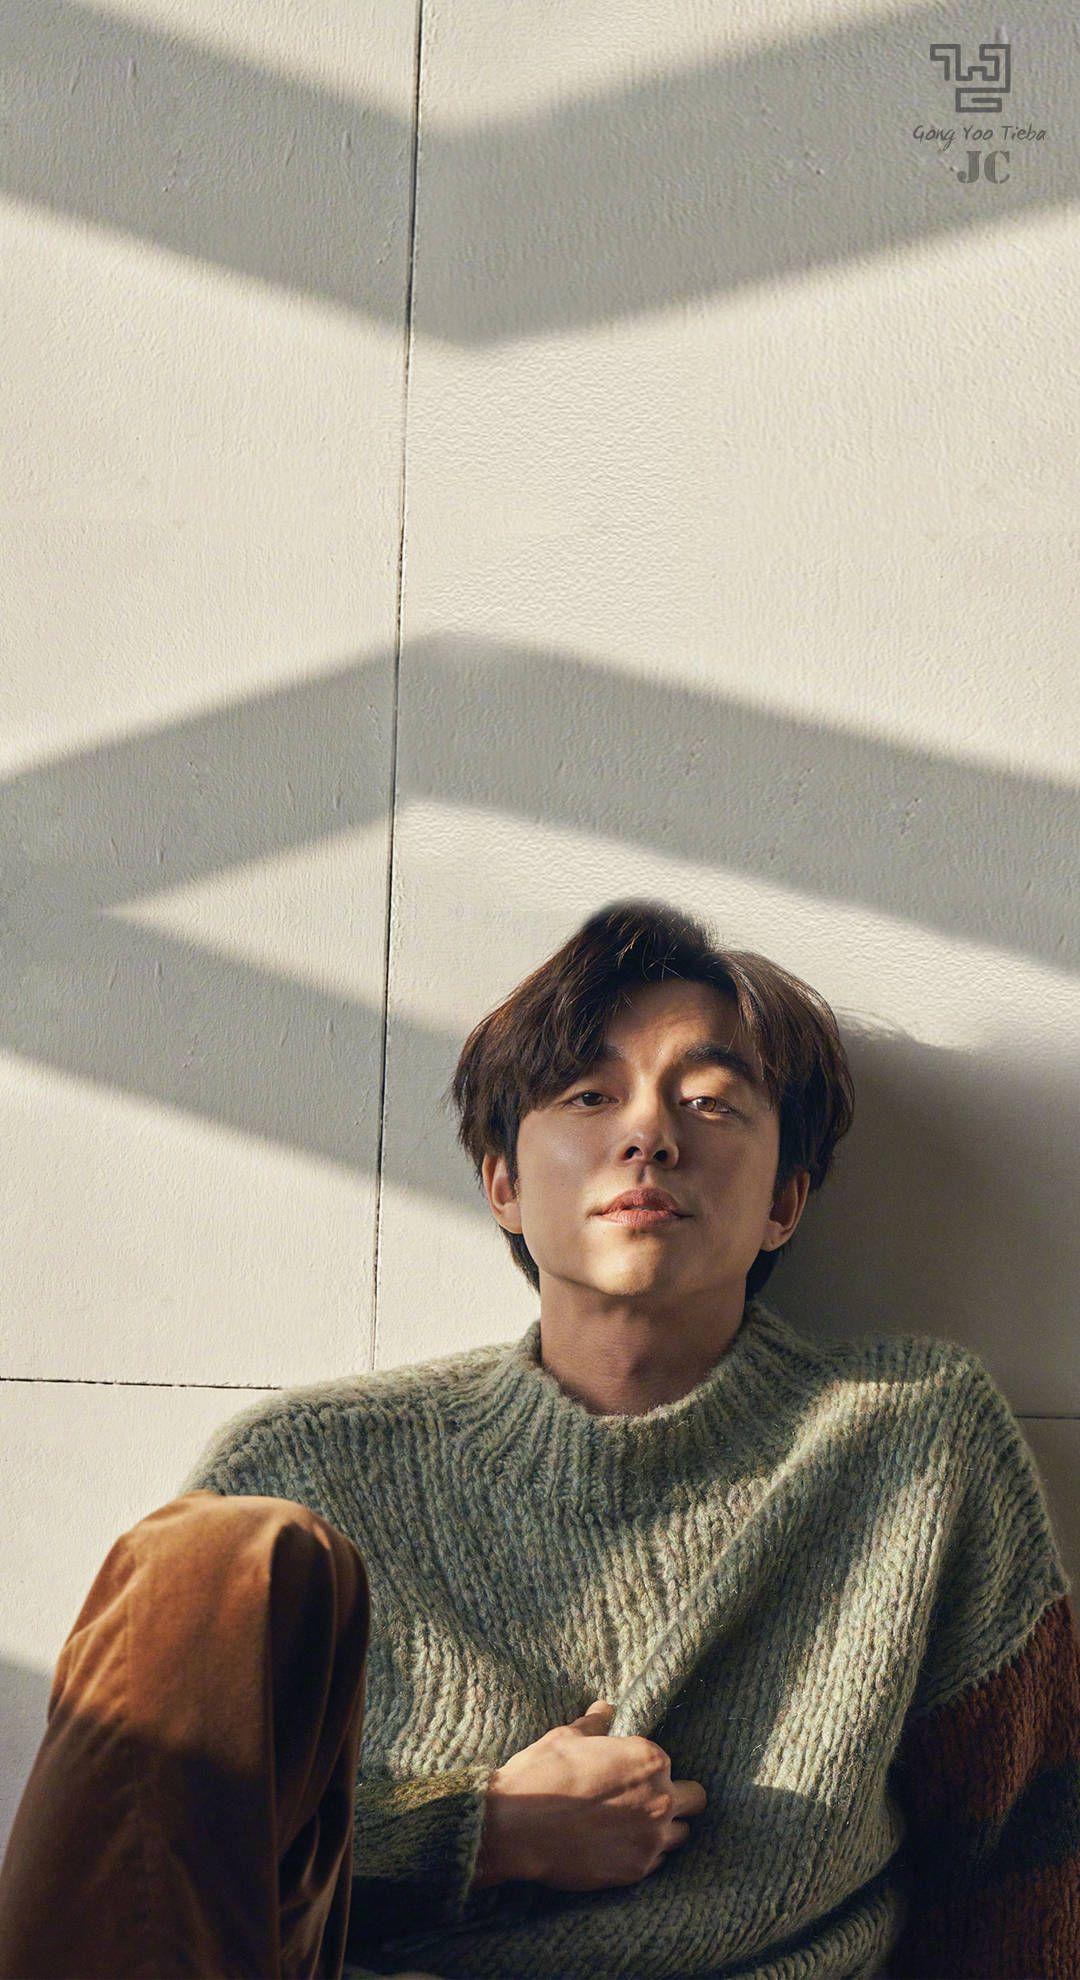 Haircut for men korean 2018 bazaar feb  cr jc  kpop u kdrama  pinterest  gong yoo kdrama